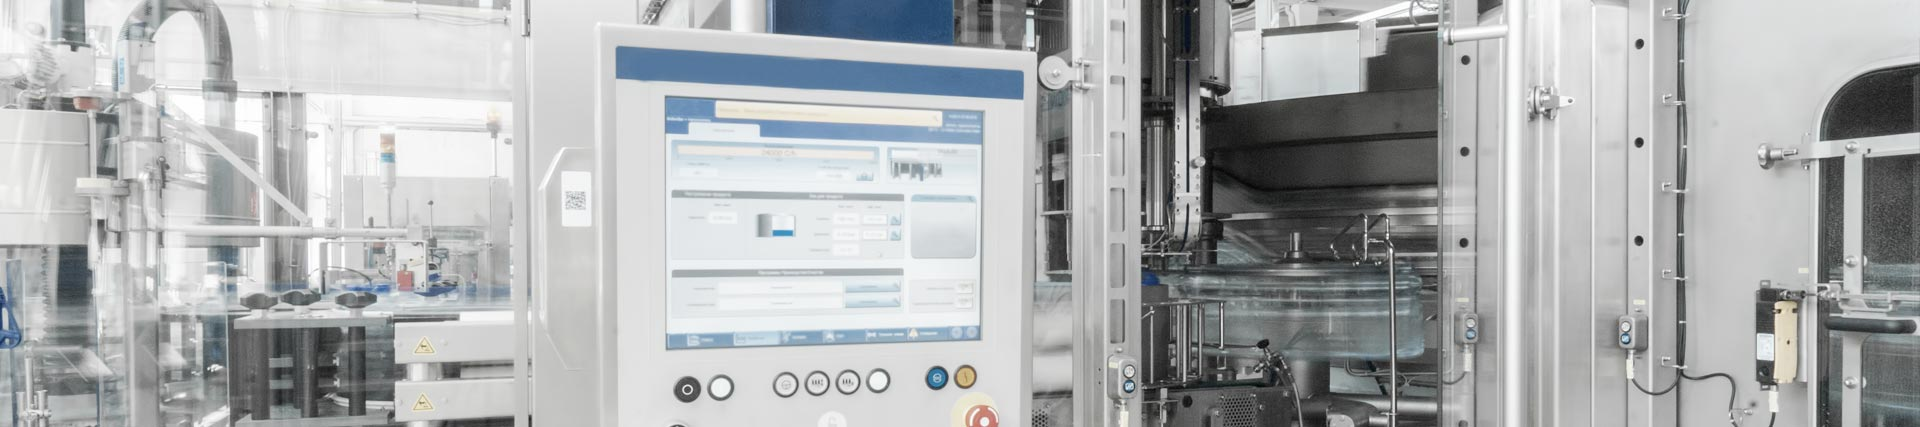 CTE Entwicklungen | Business Area: Electrical Engineering